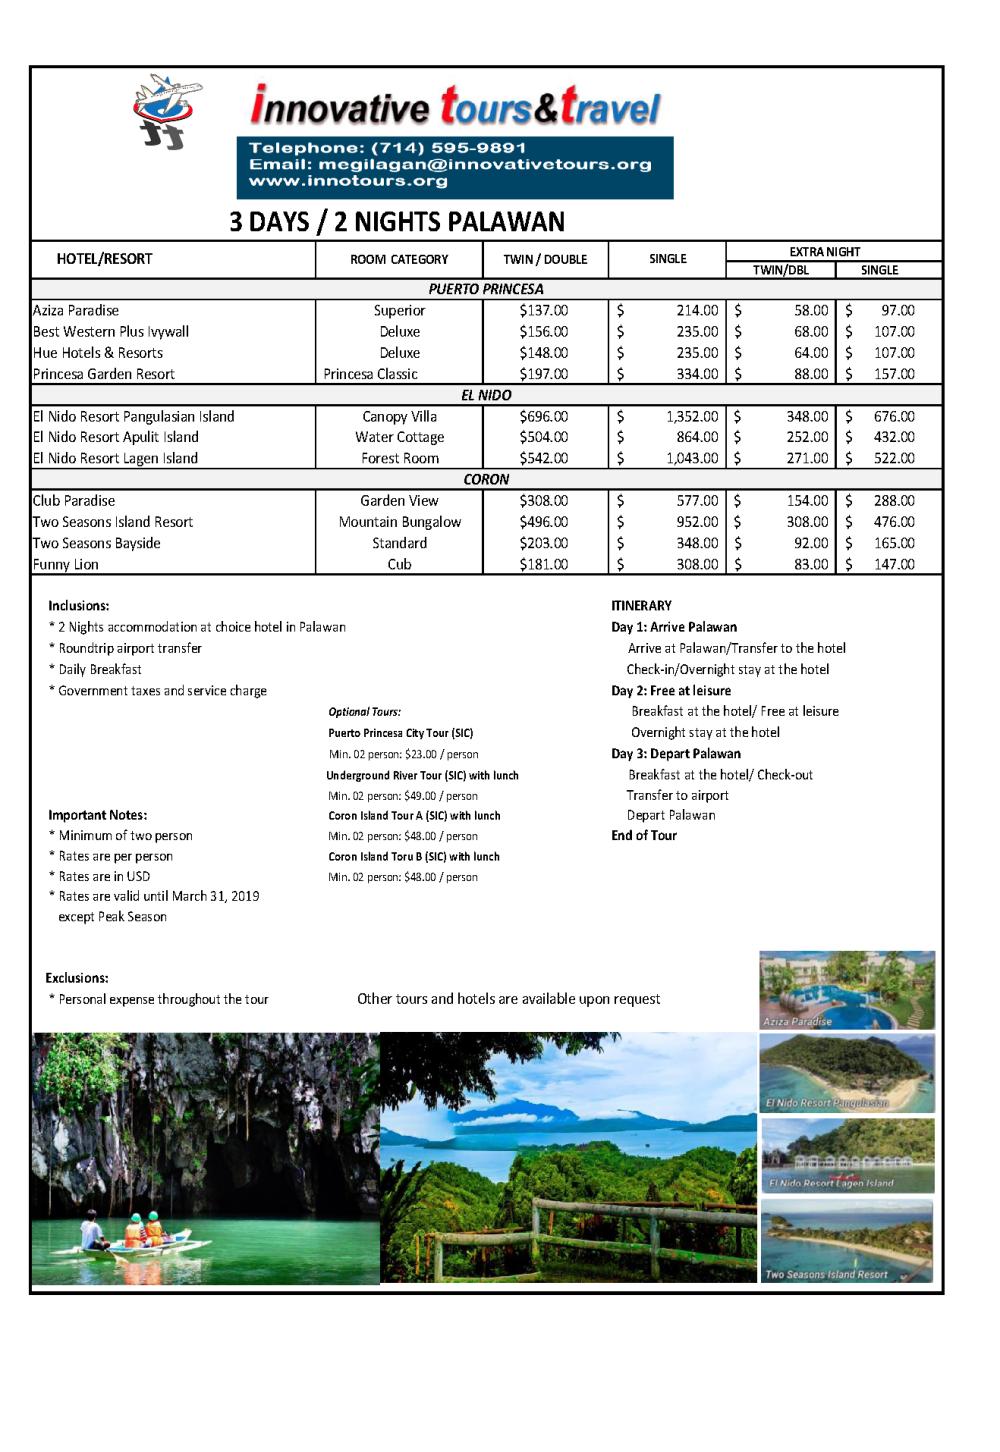 Free & Easy Palawan_IVT 2018 rates